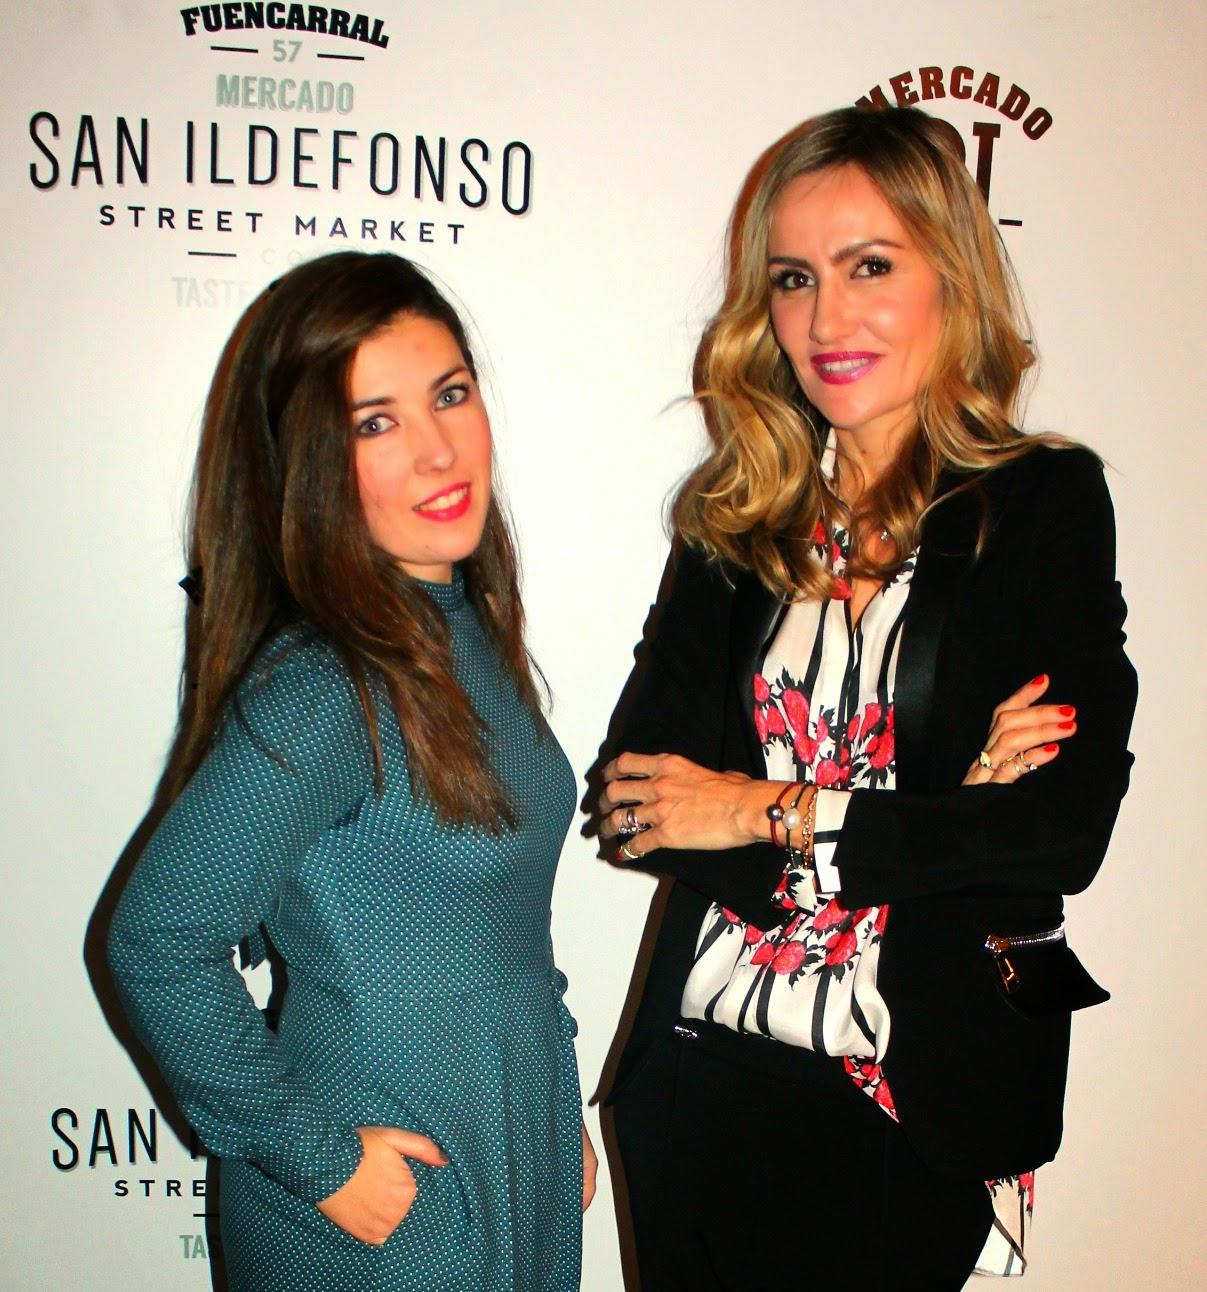 Sonia H Esencia Trendy, Clara Courel, periodista, event, Encuentros Bazar, El Mundo, Mercado de San Ildefonso, Asesora de Imagen, Personal Shopper, Luxe, Madrid, style, foody, press, moda, fashion, fashionblogger,